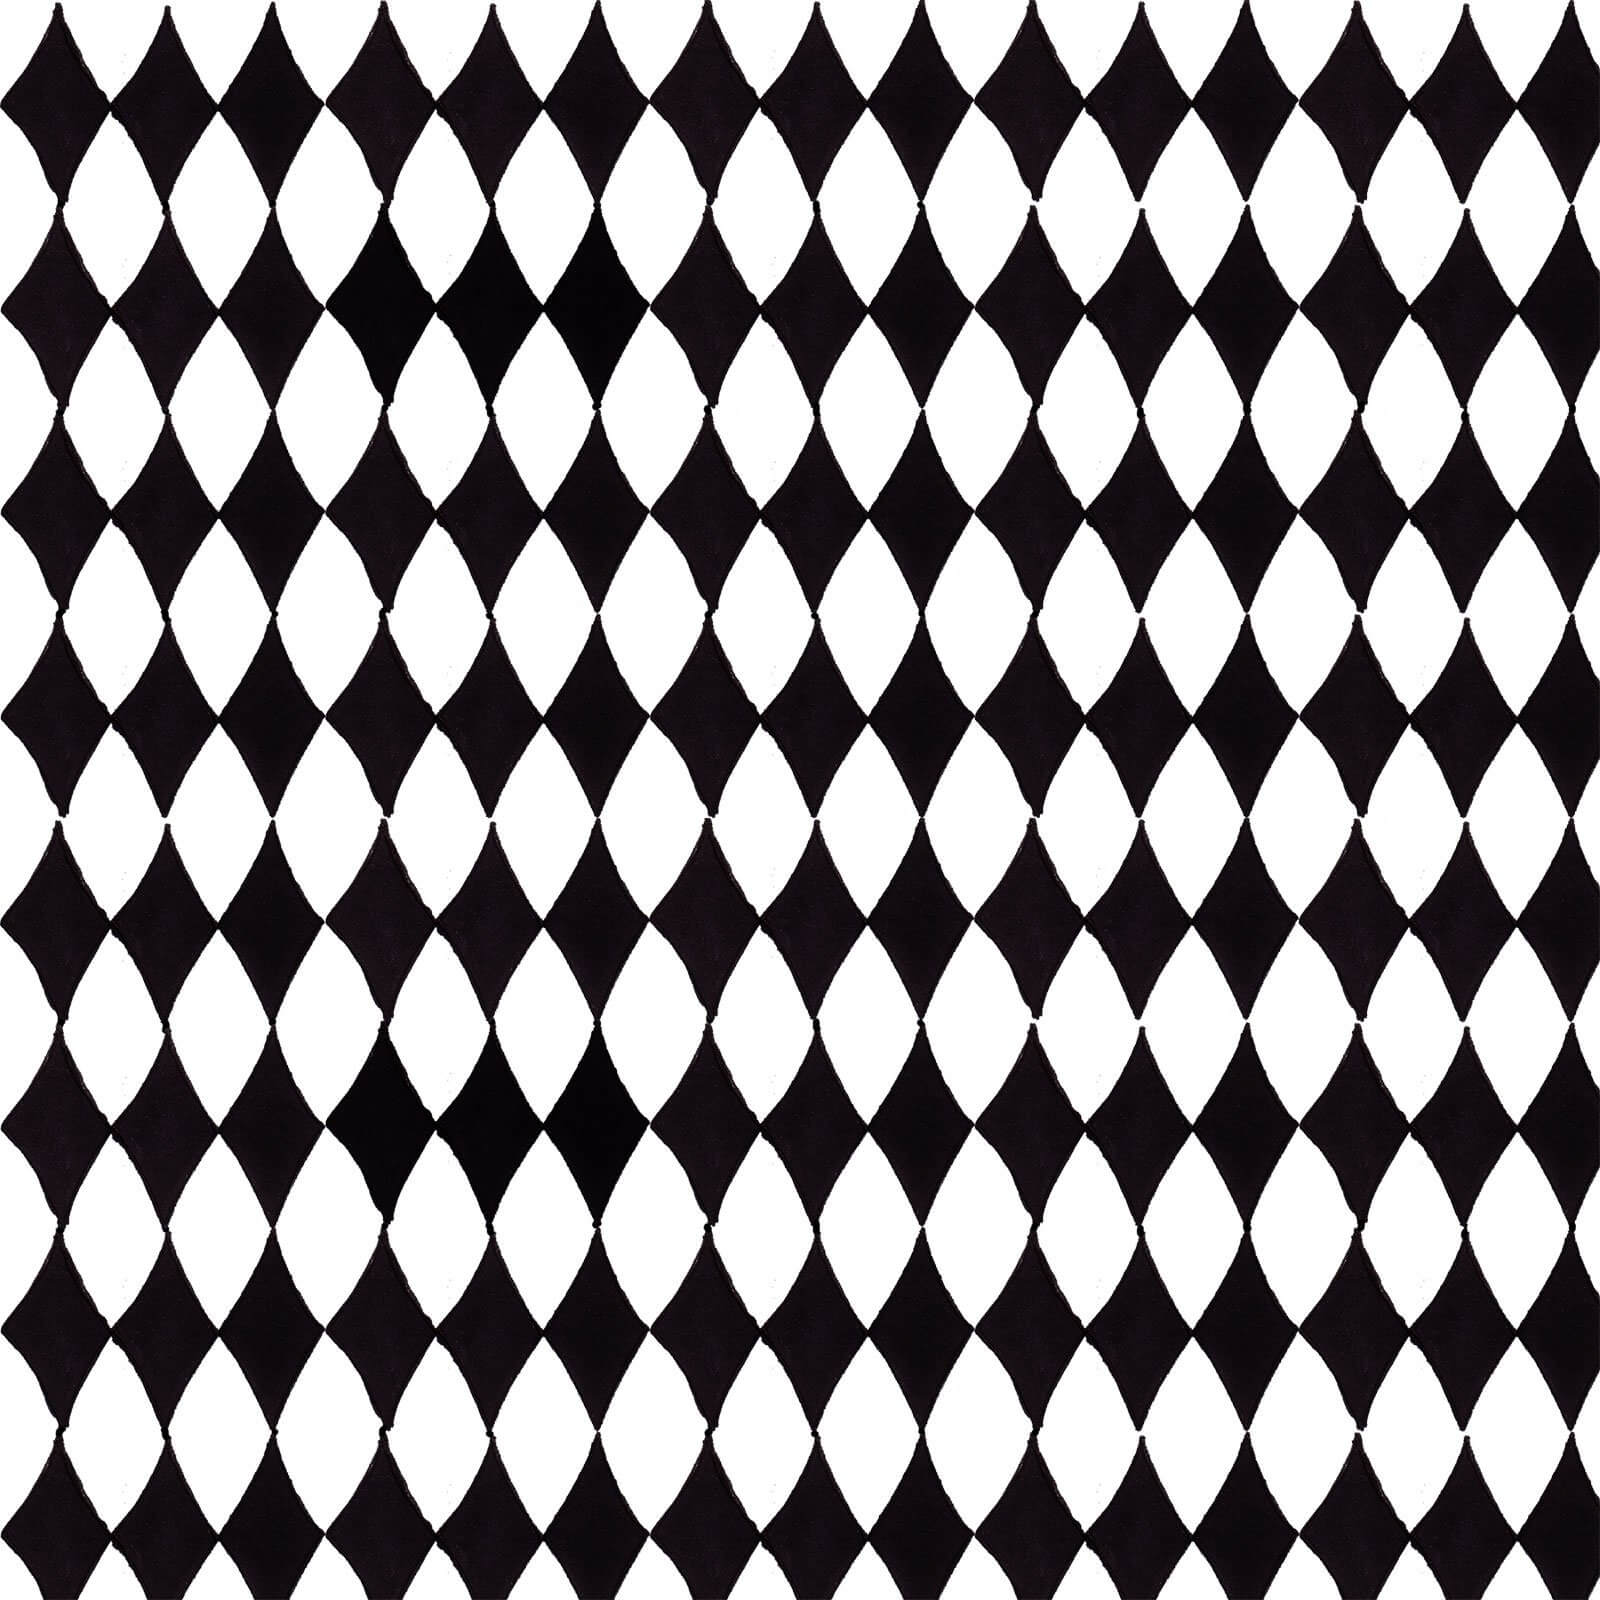 【Loralie Designs】Diamond White / Black(ULH-269)